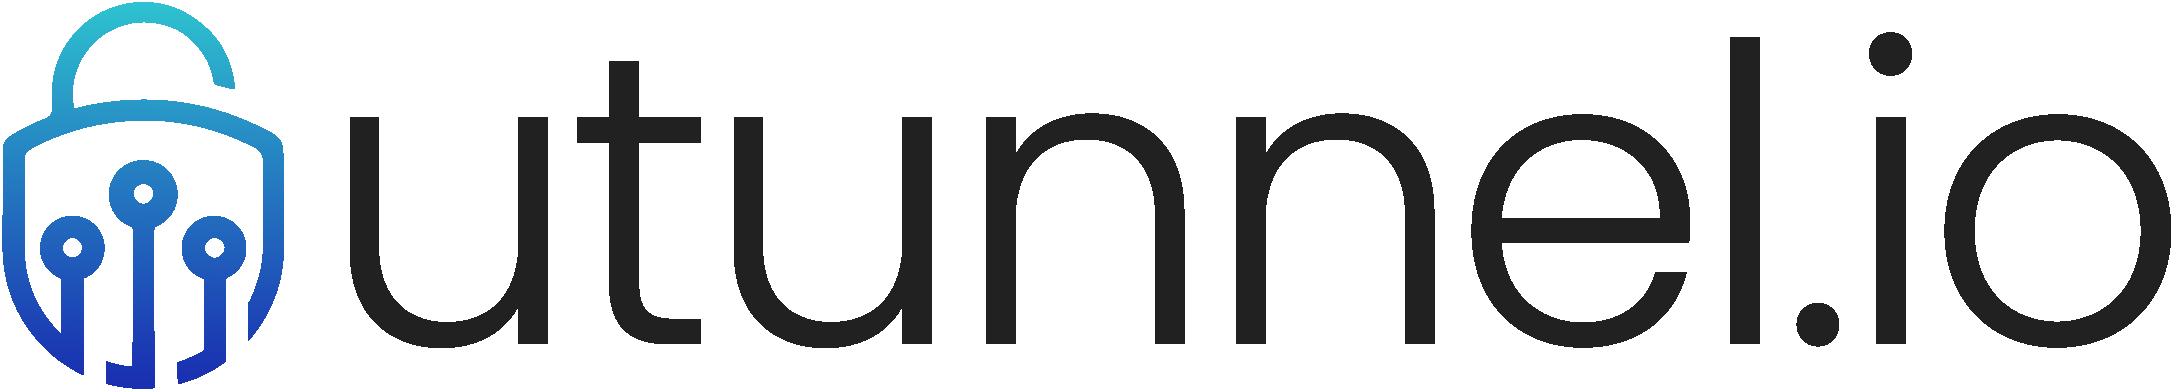 Utunnel Discount Code